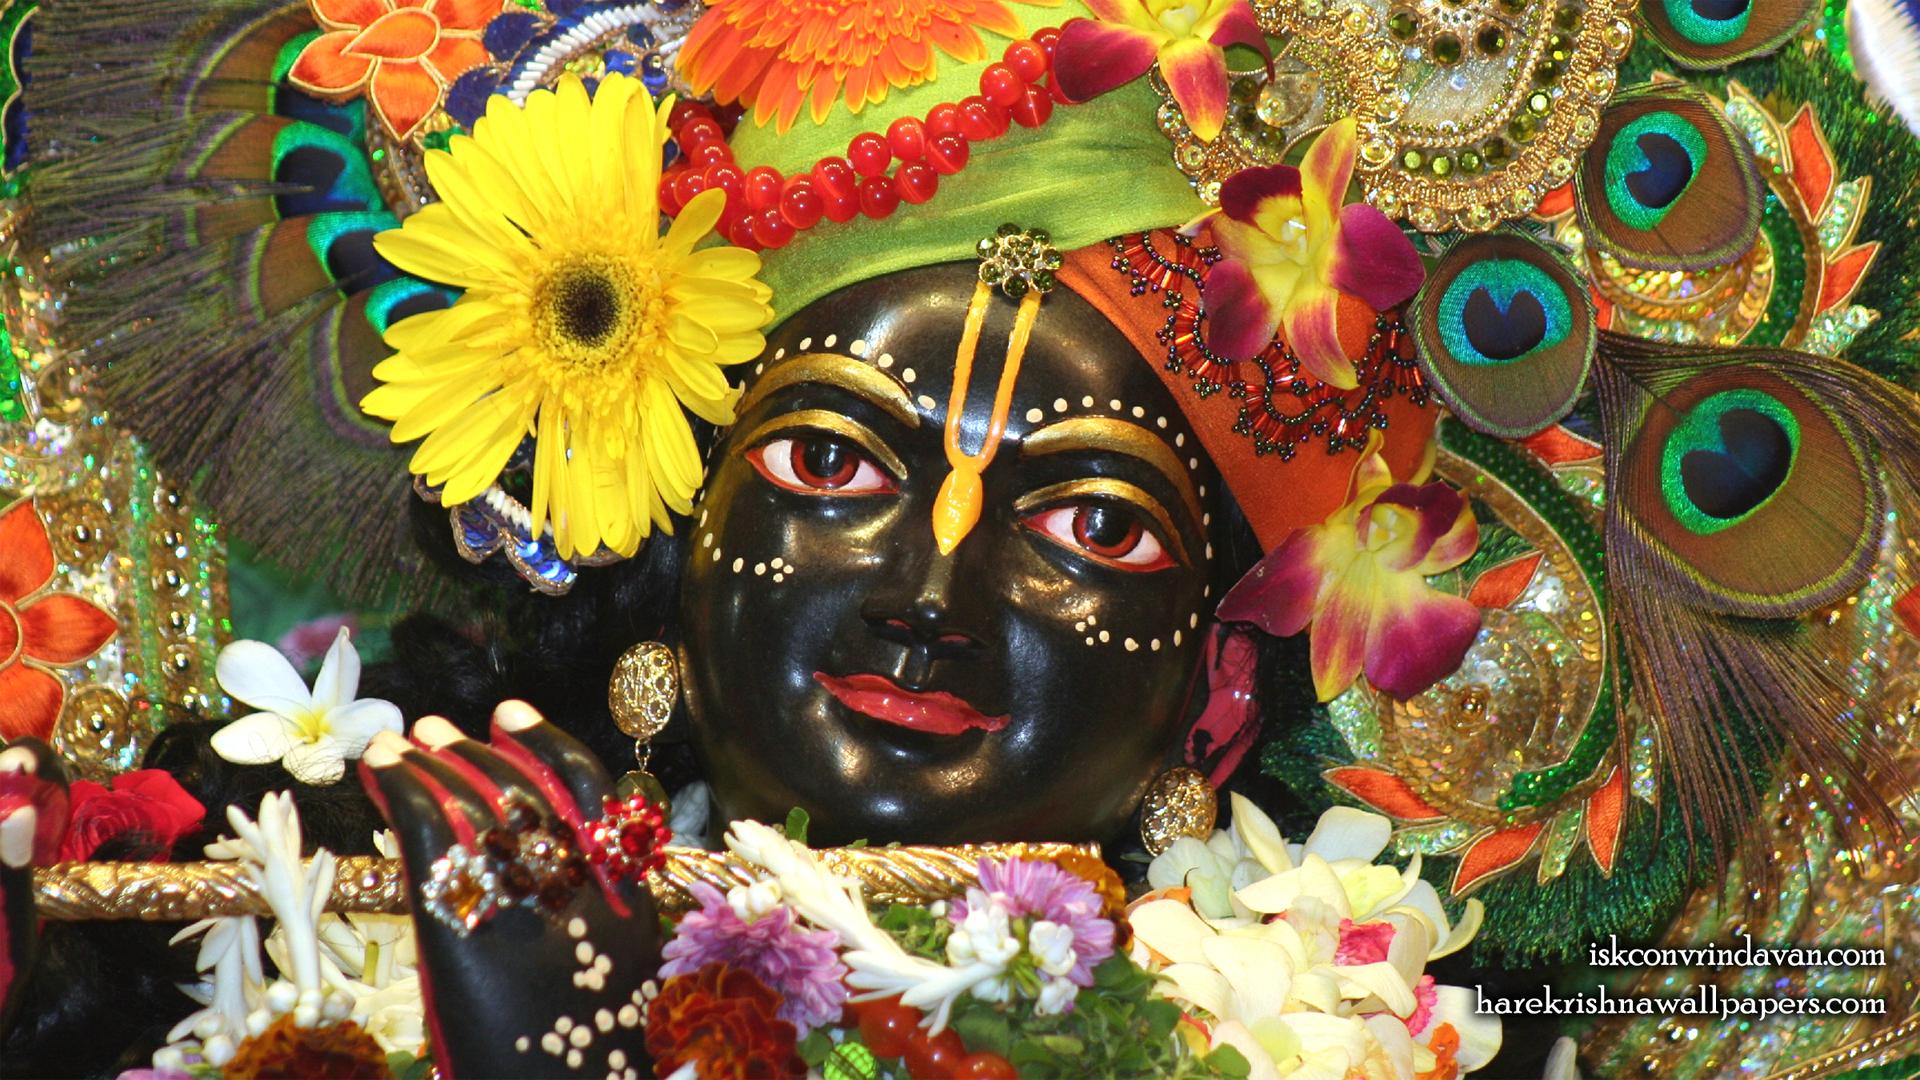 Sri Shyamsundar Close up Wallpaper (017) Size 1920x1080 Download